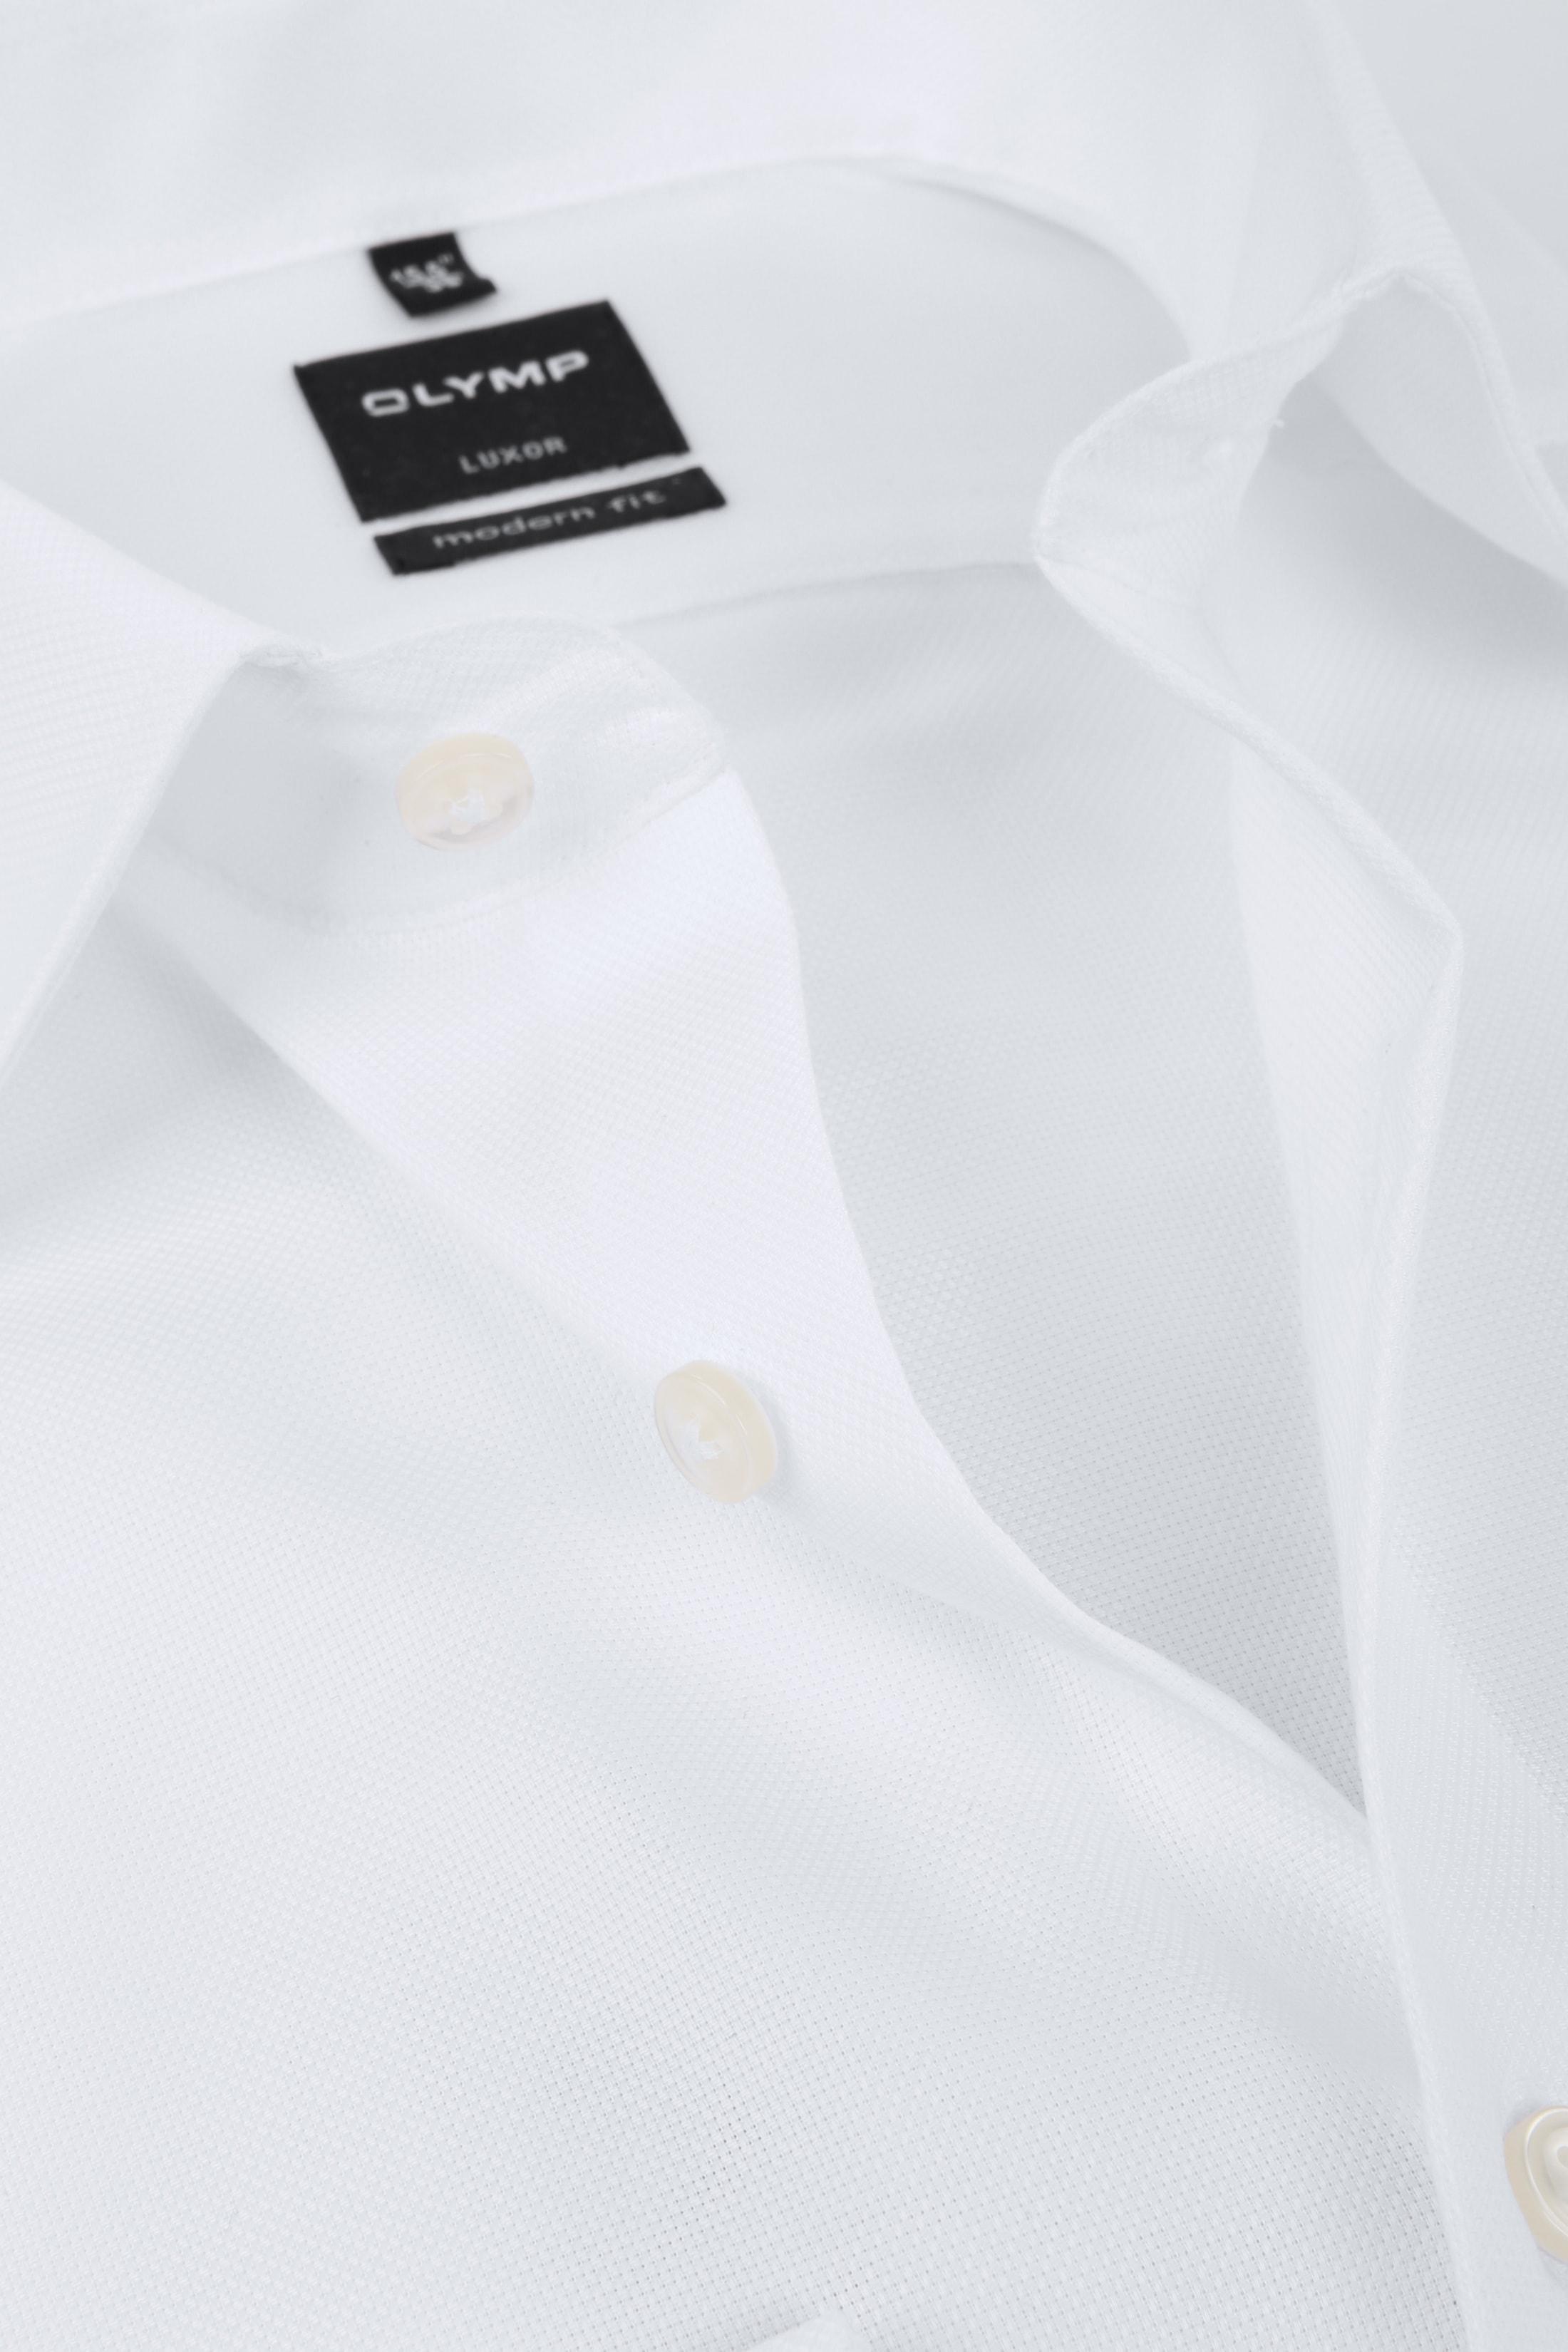 Olymp Luxor Shirt Modern Fit White foto 1